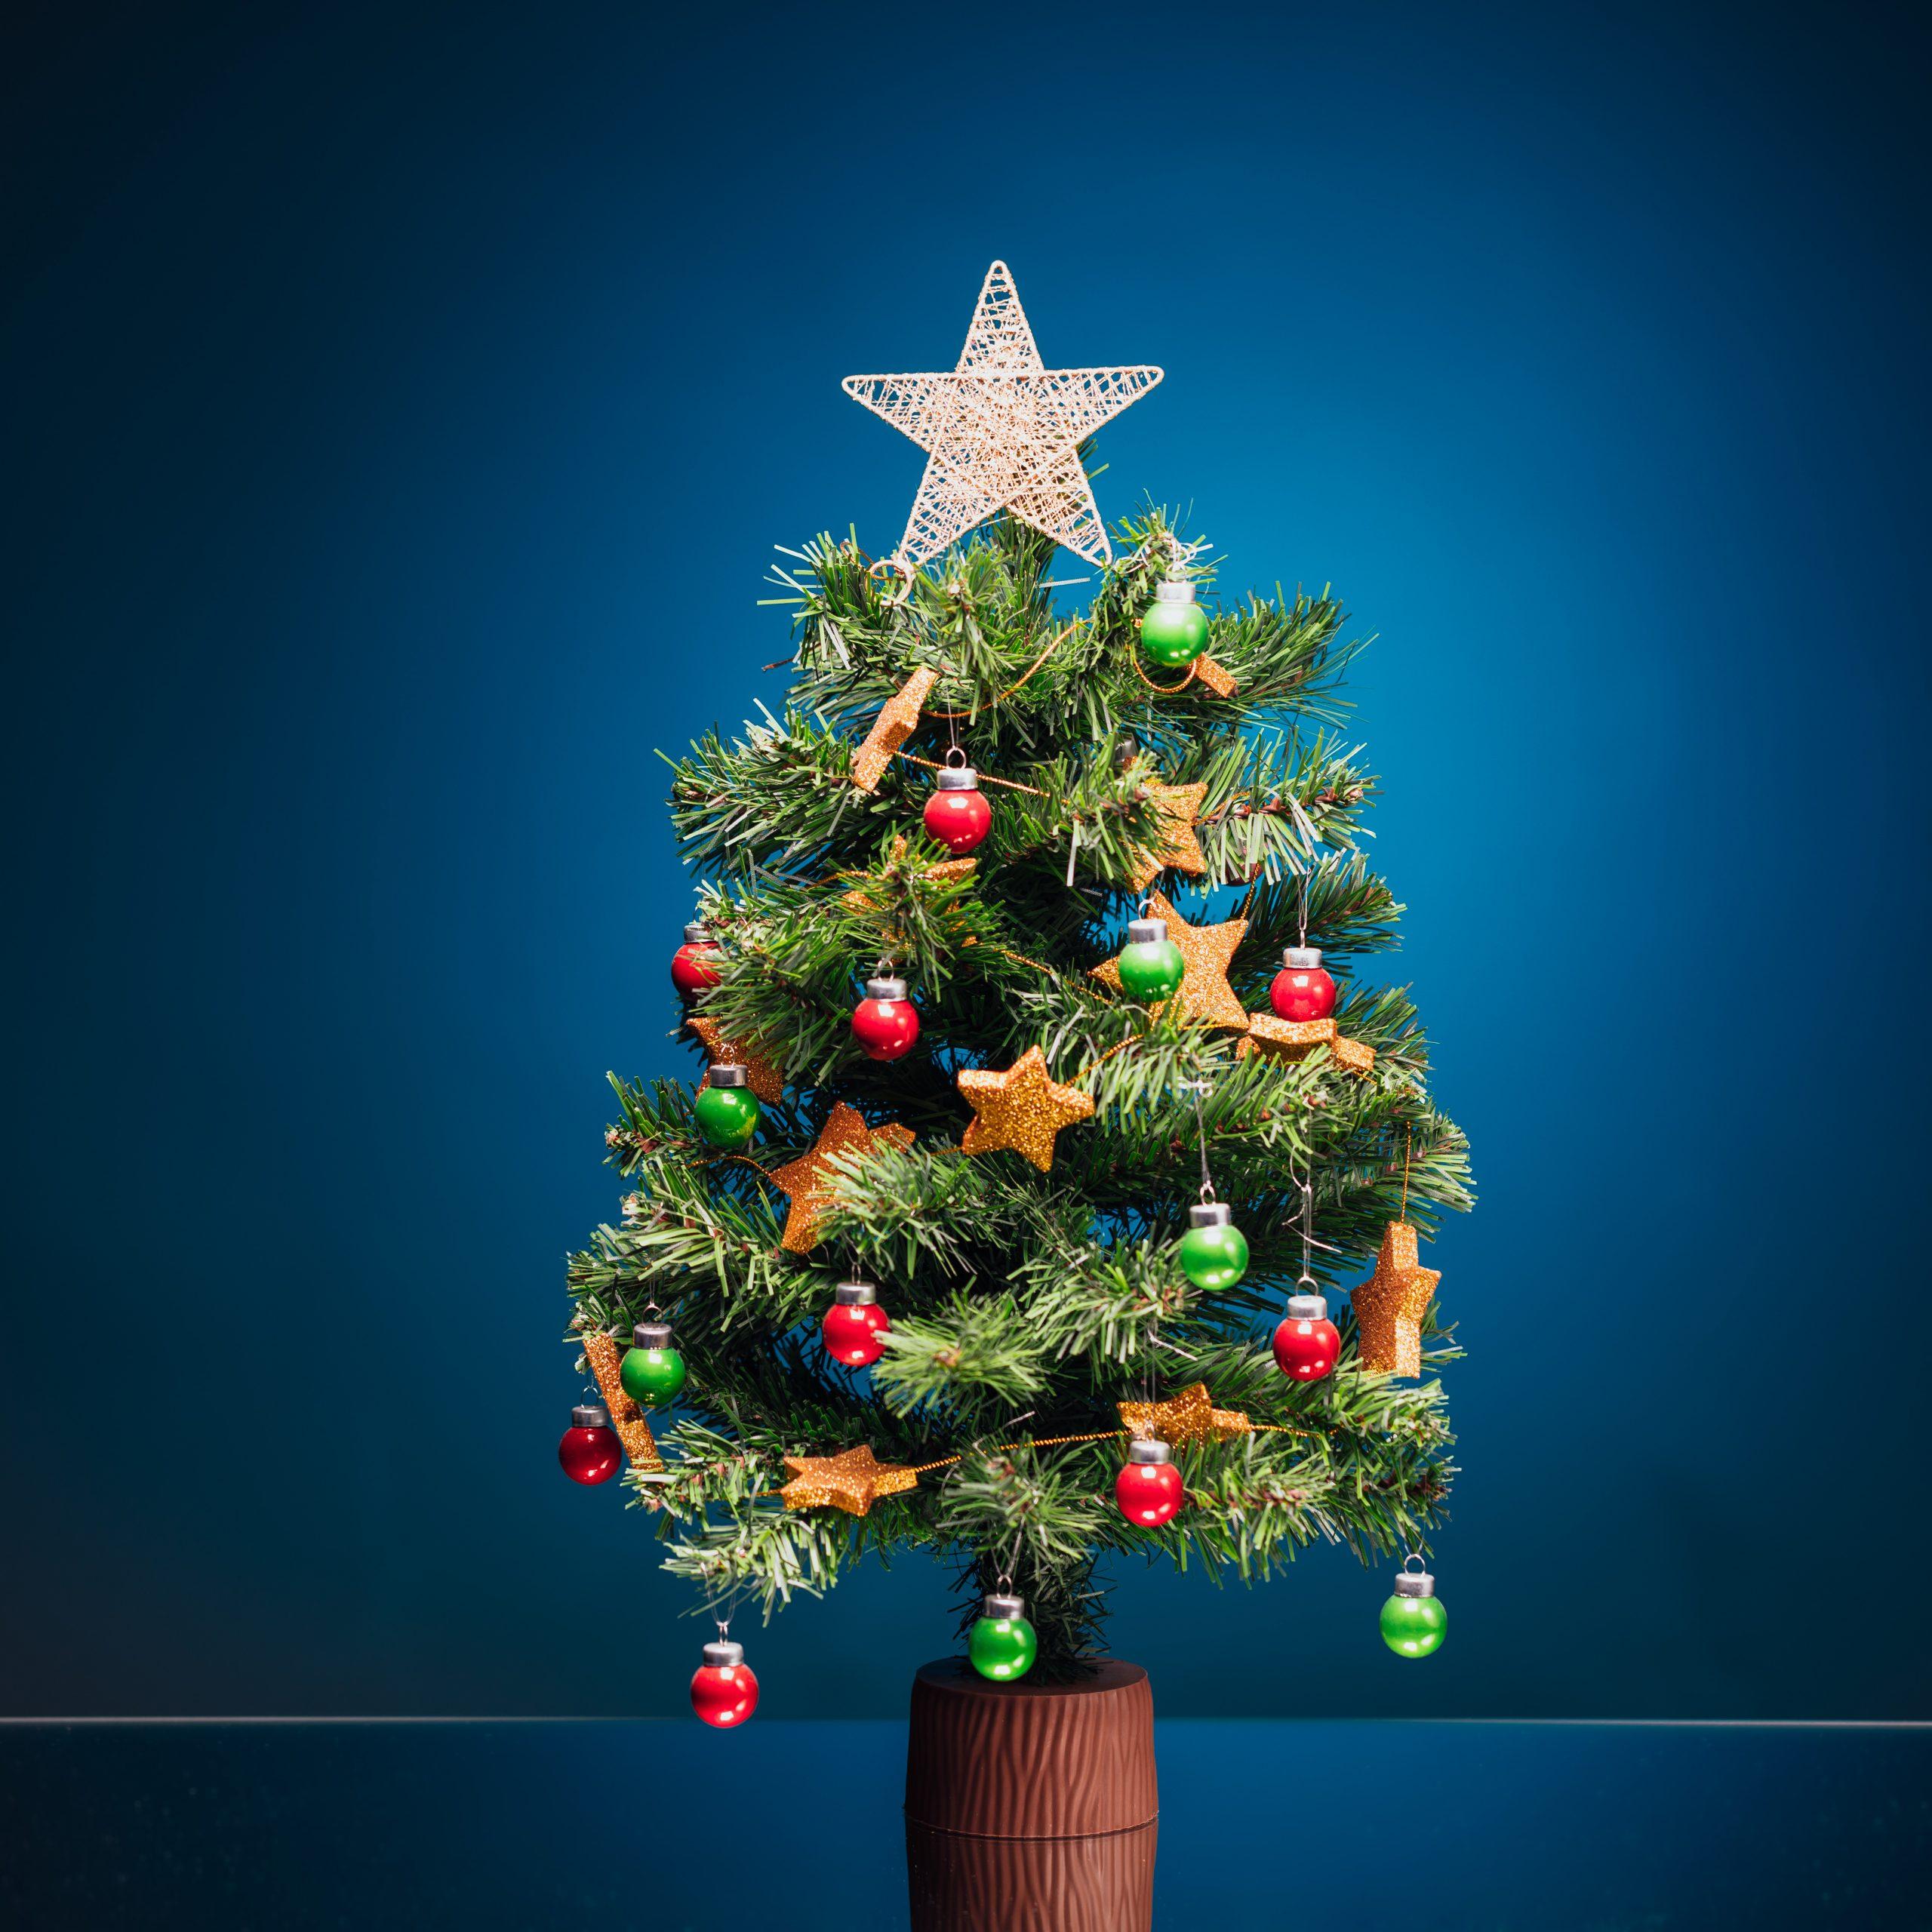 festive Christmas tree on blue background